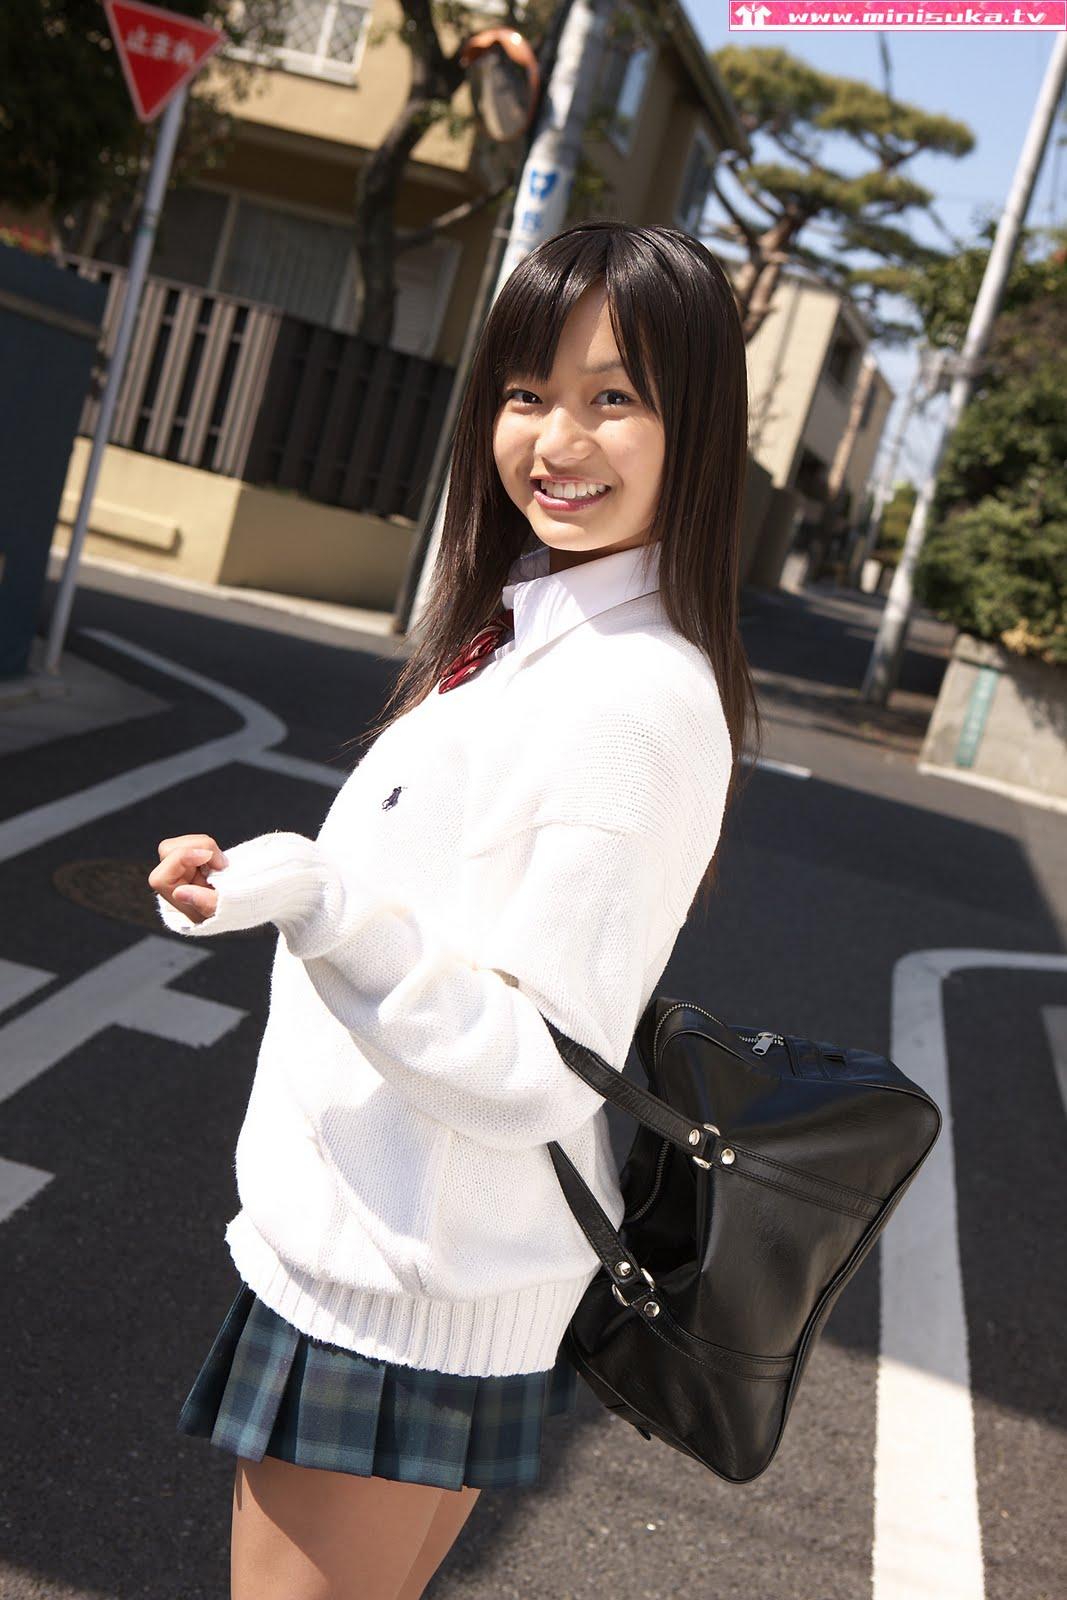 Mayumi Yamanaka In Winter School Uniform  Japanese Girls 2011-1547